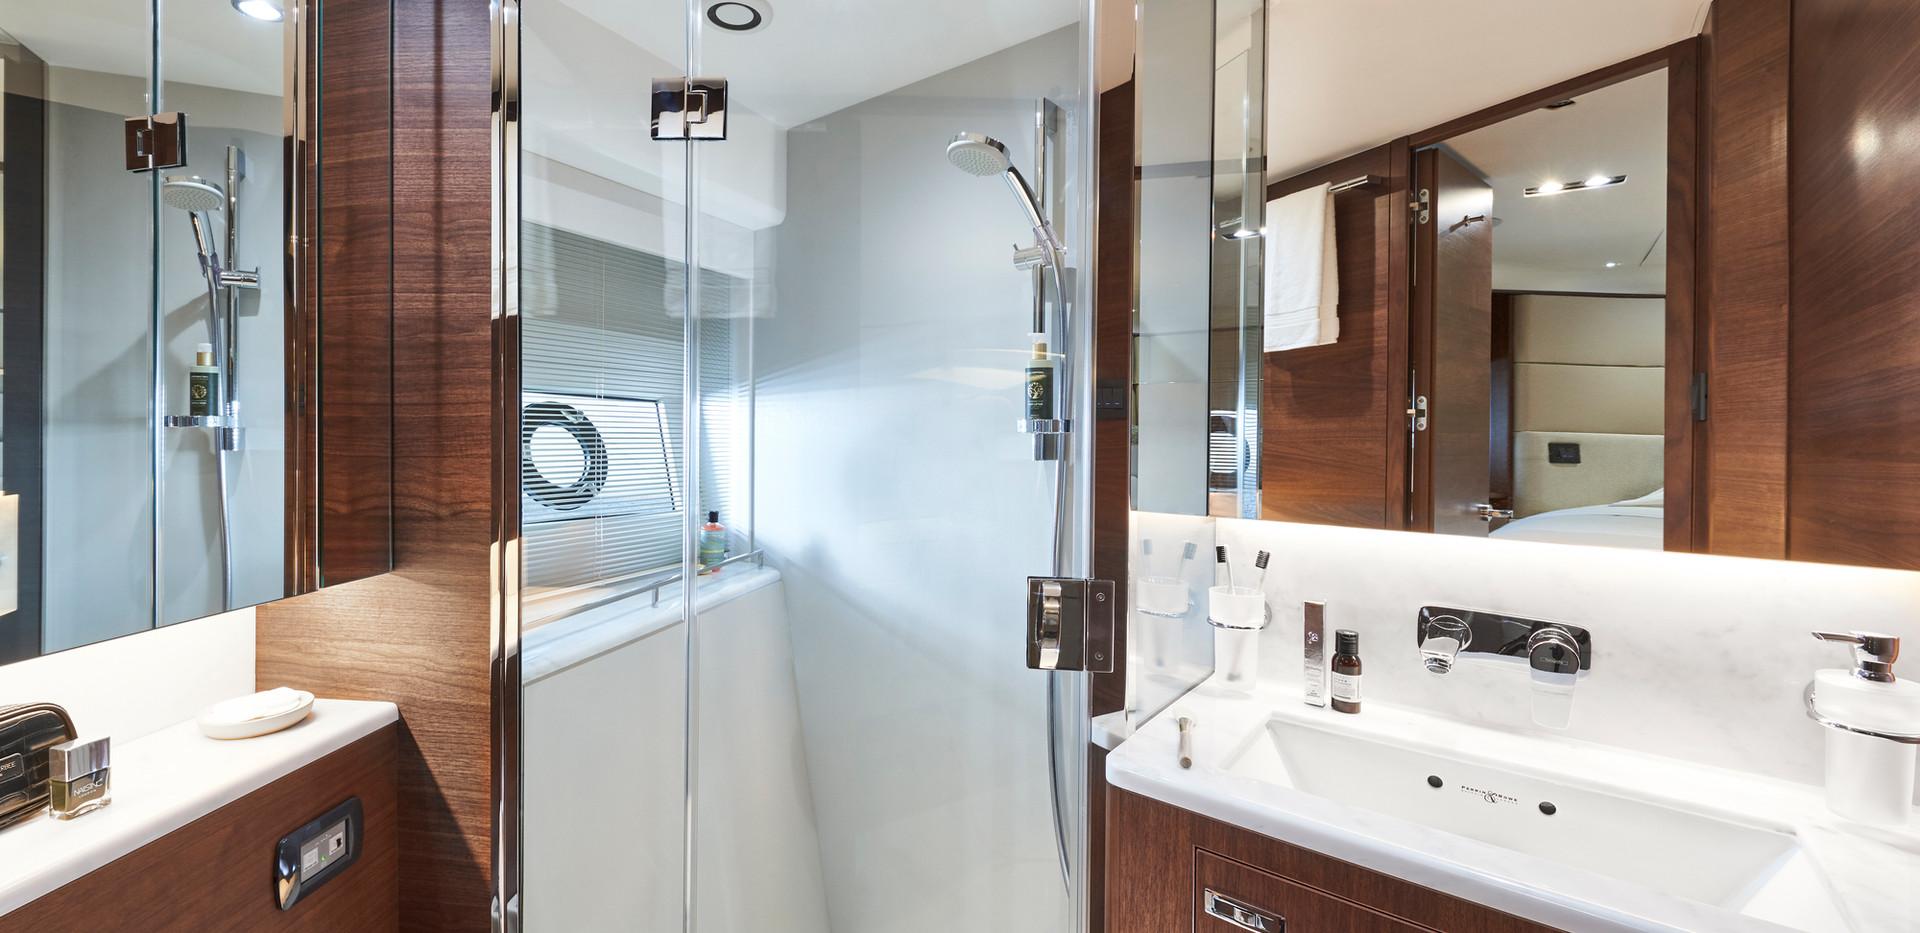 y78-interior-forward-cabin-bathroom-waln